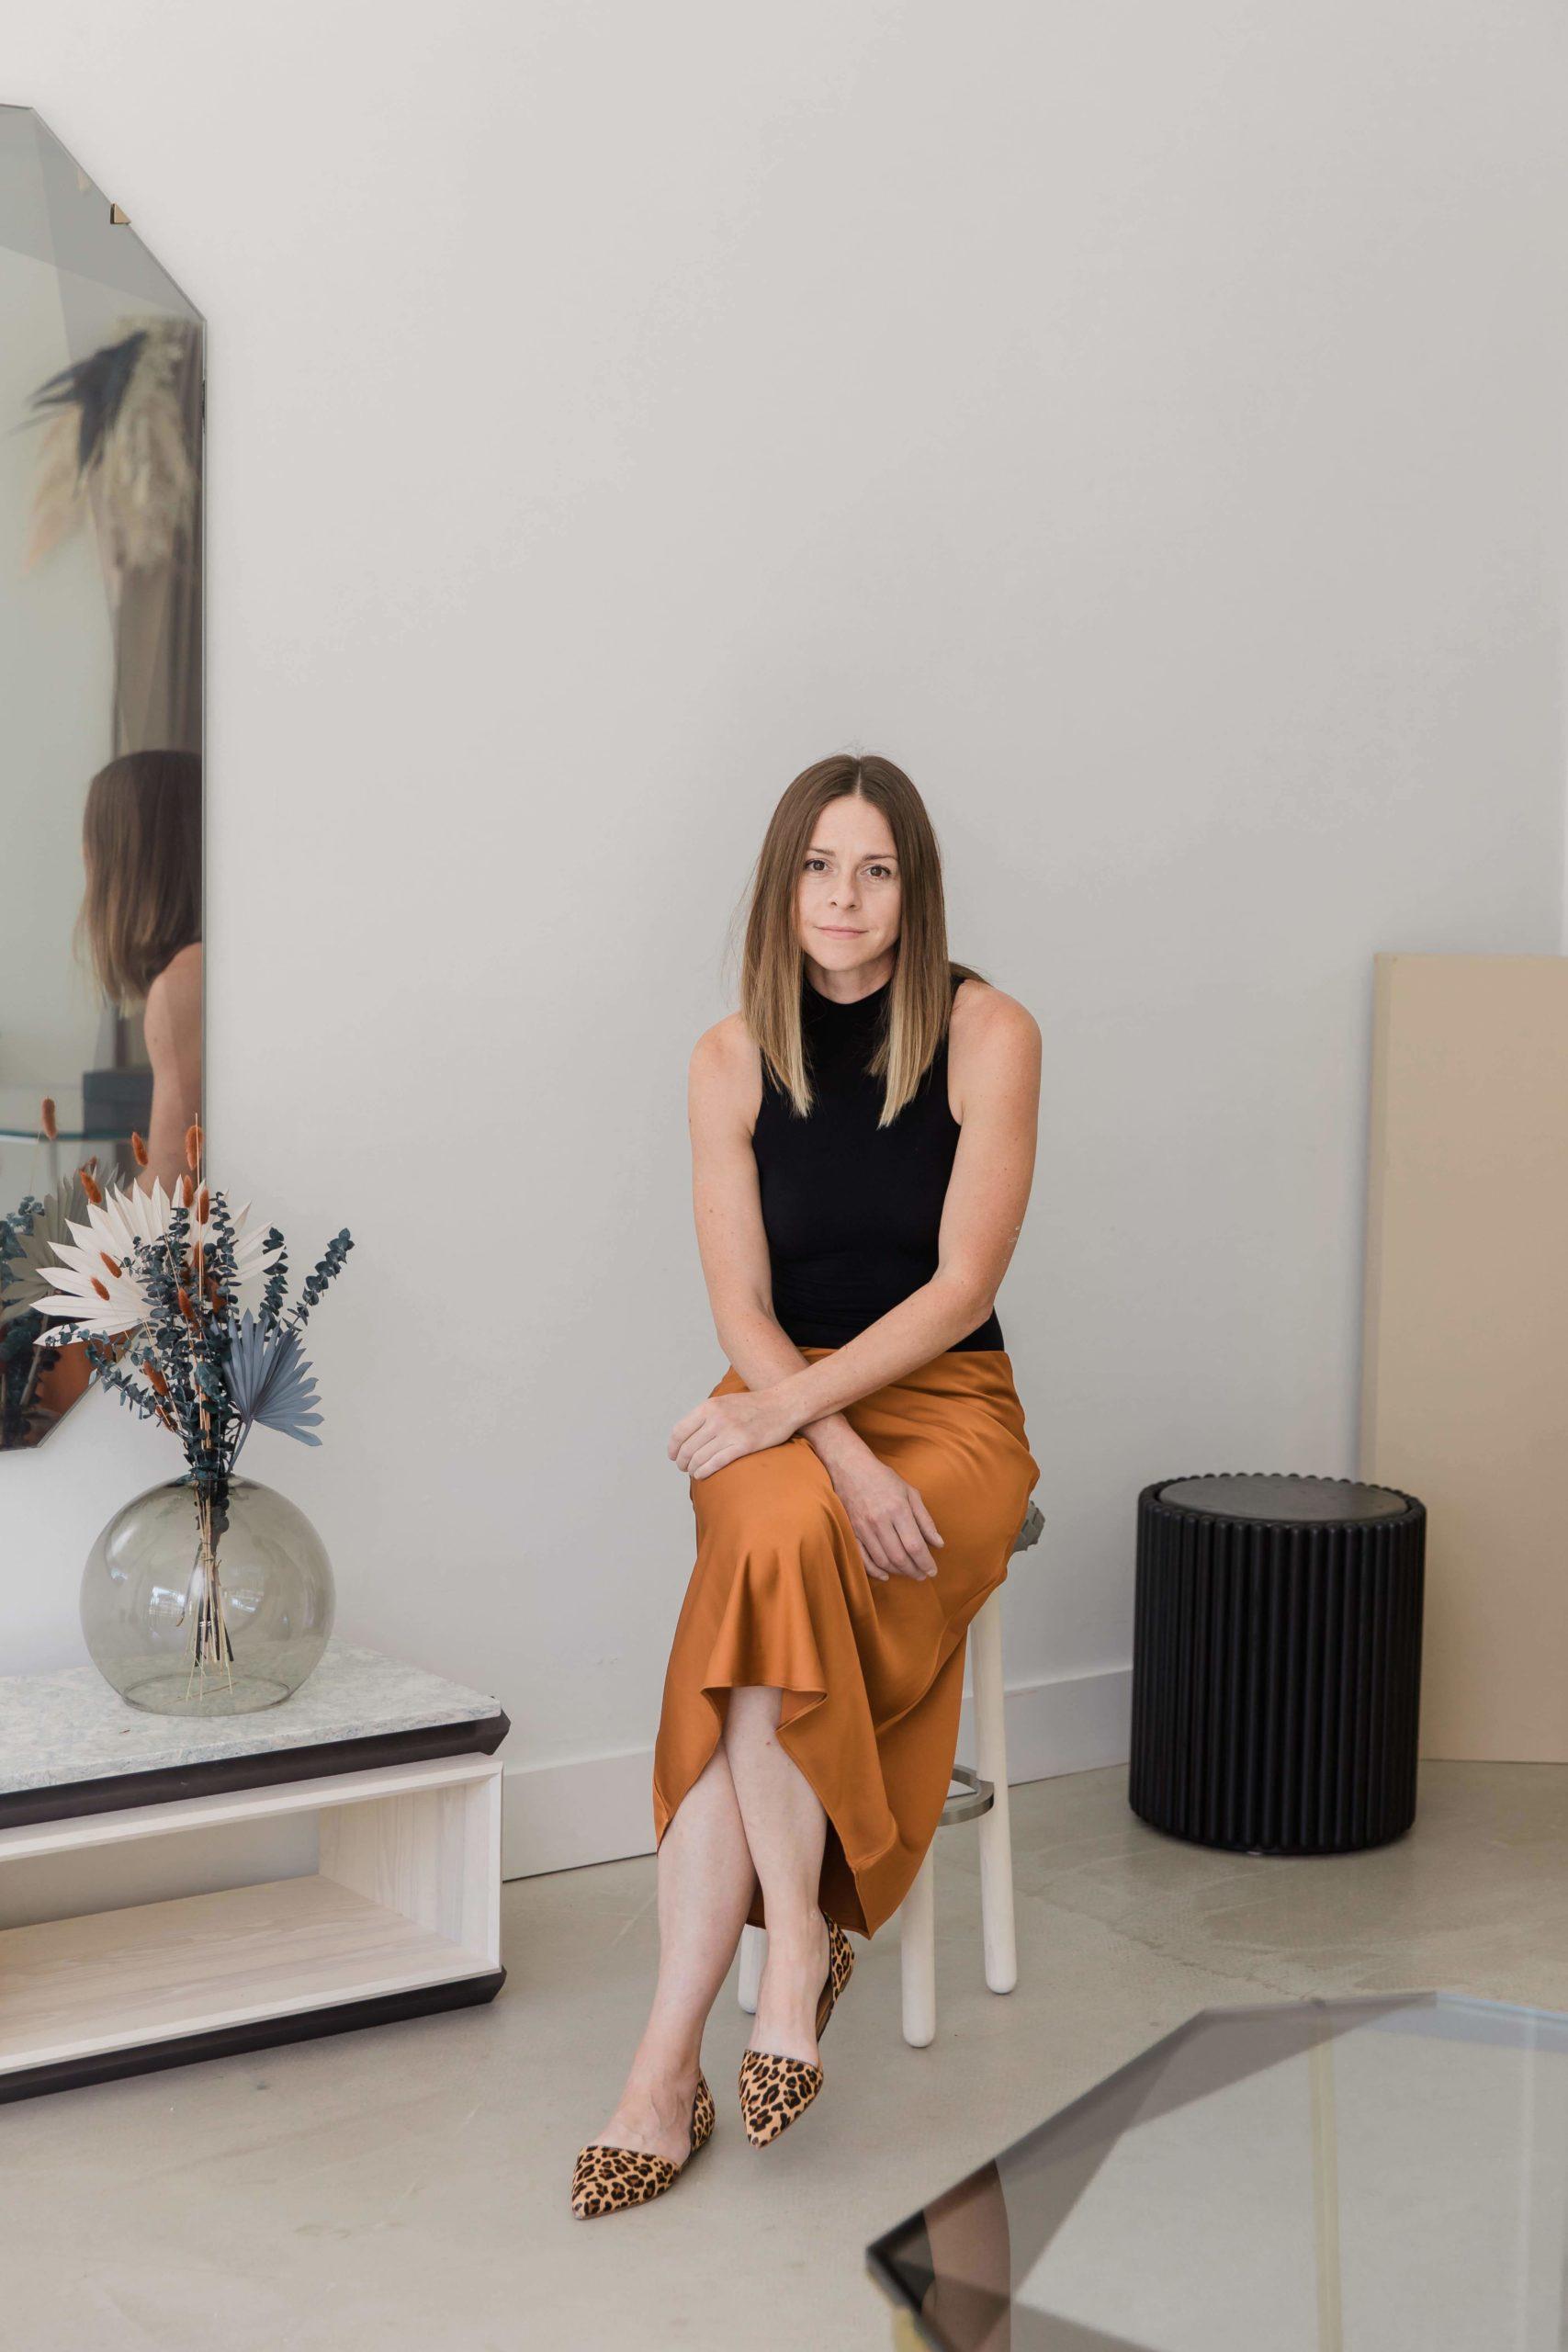 Debra Folz has opened a new showroom in Westhampton.